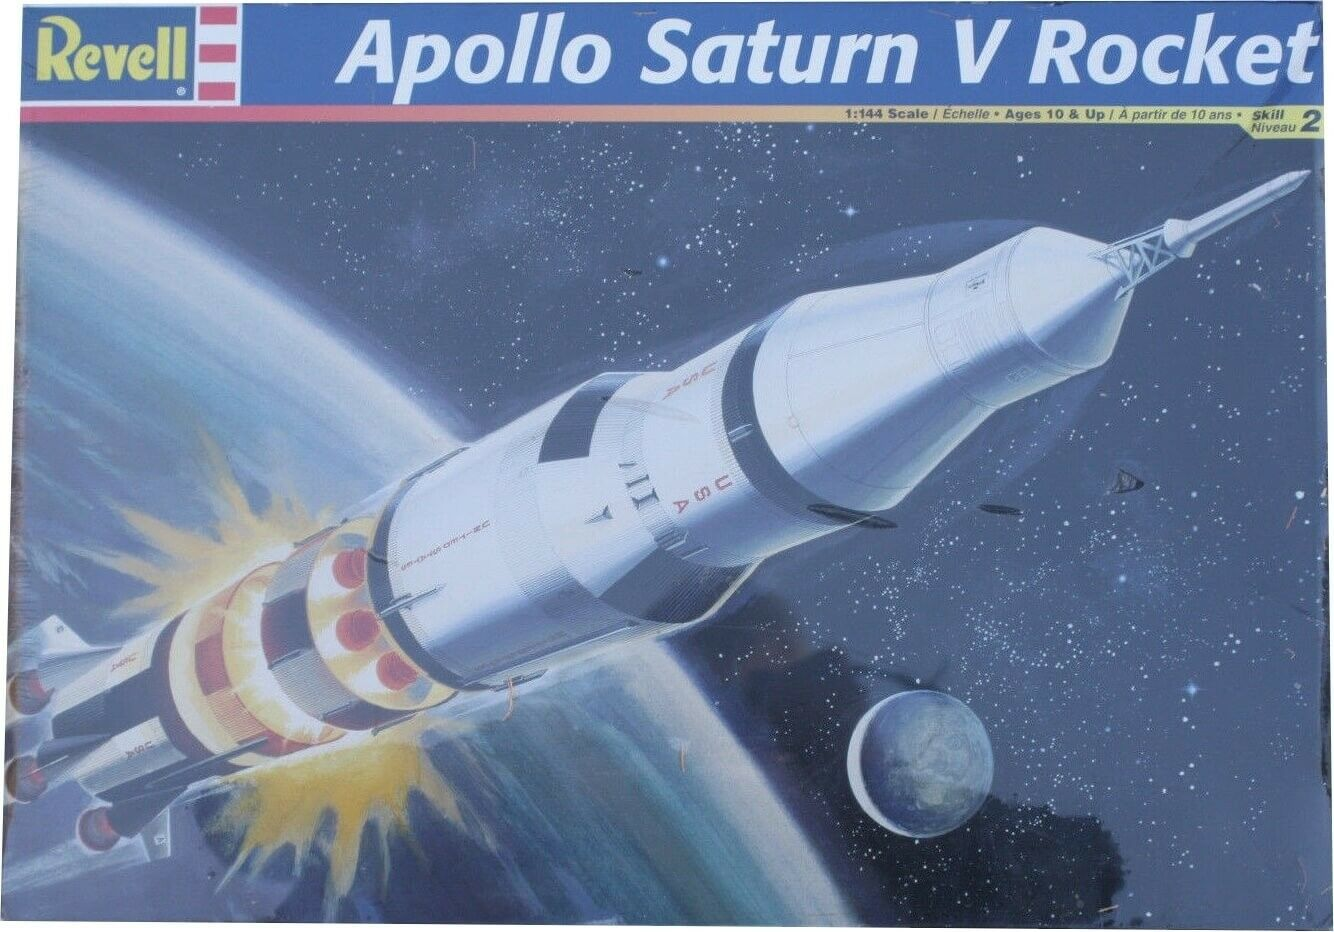 Revell  Apollo Saturn V Rocket Ref 85-5082 Escala 1 144